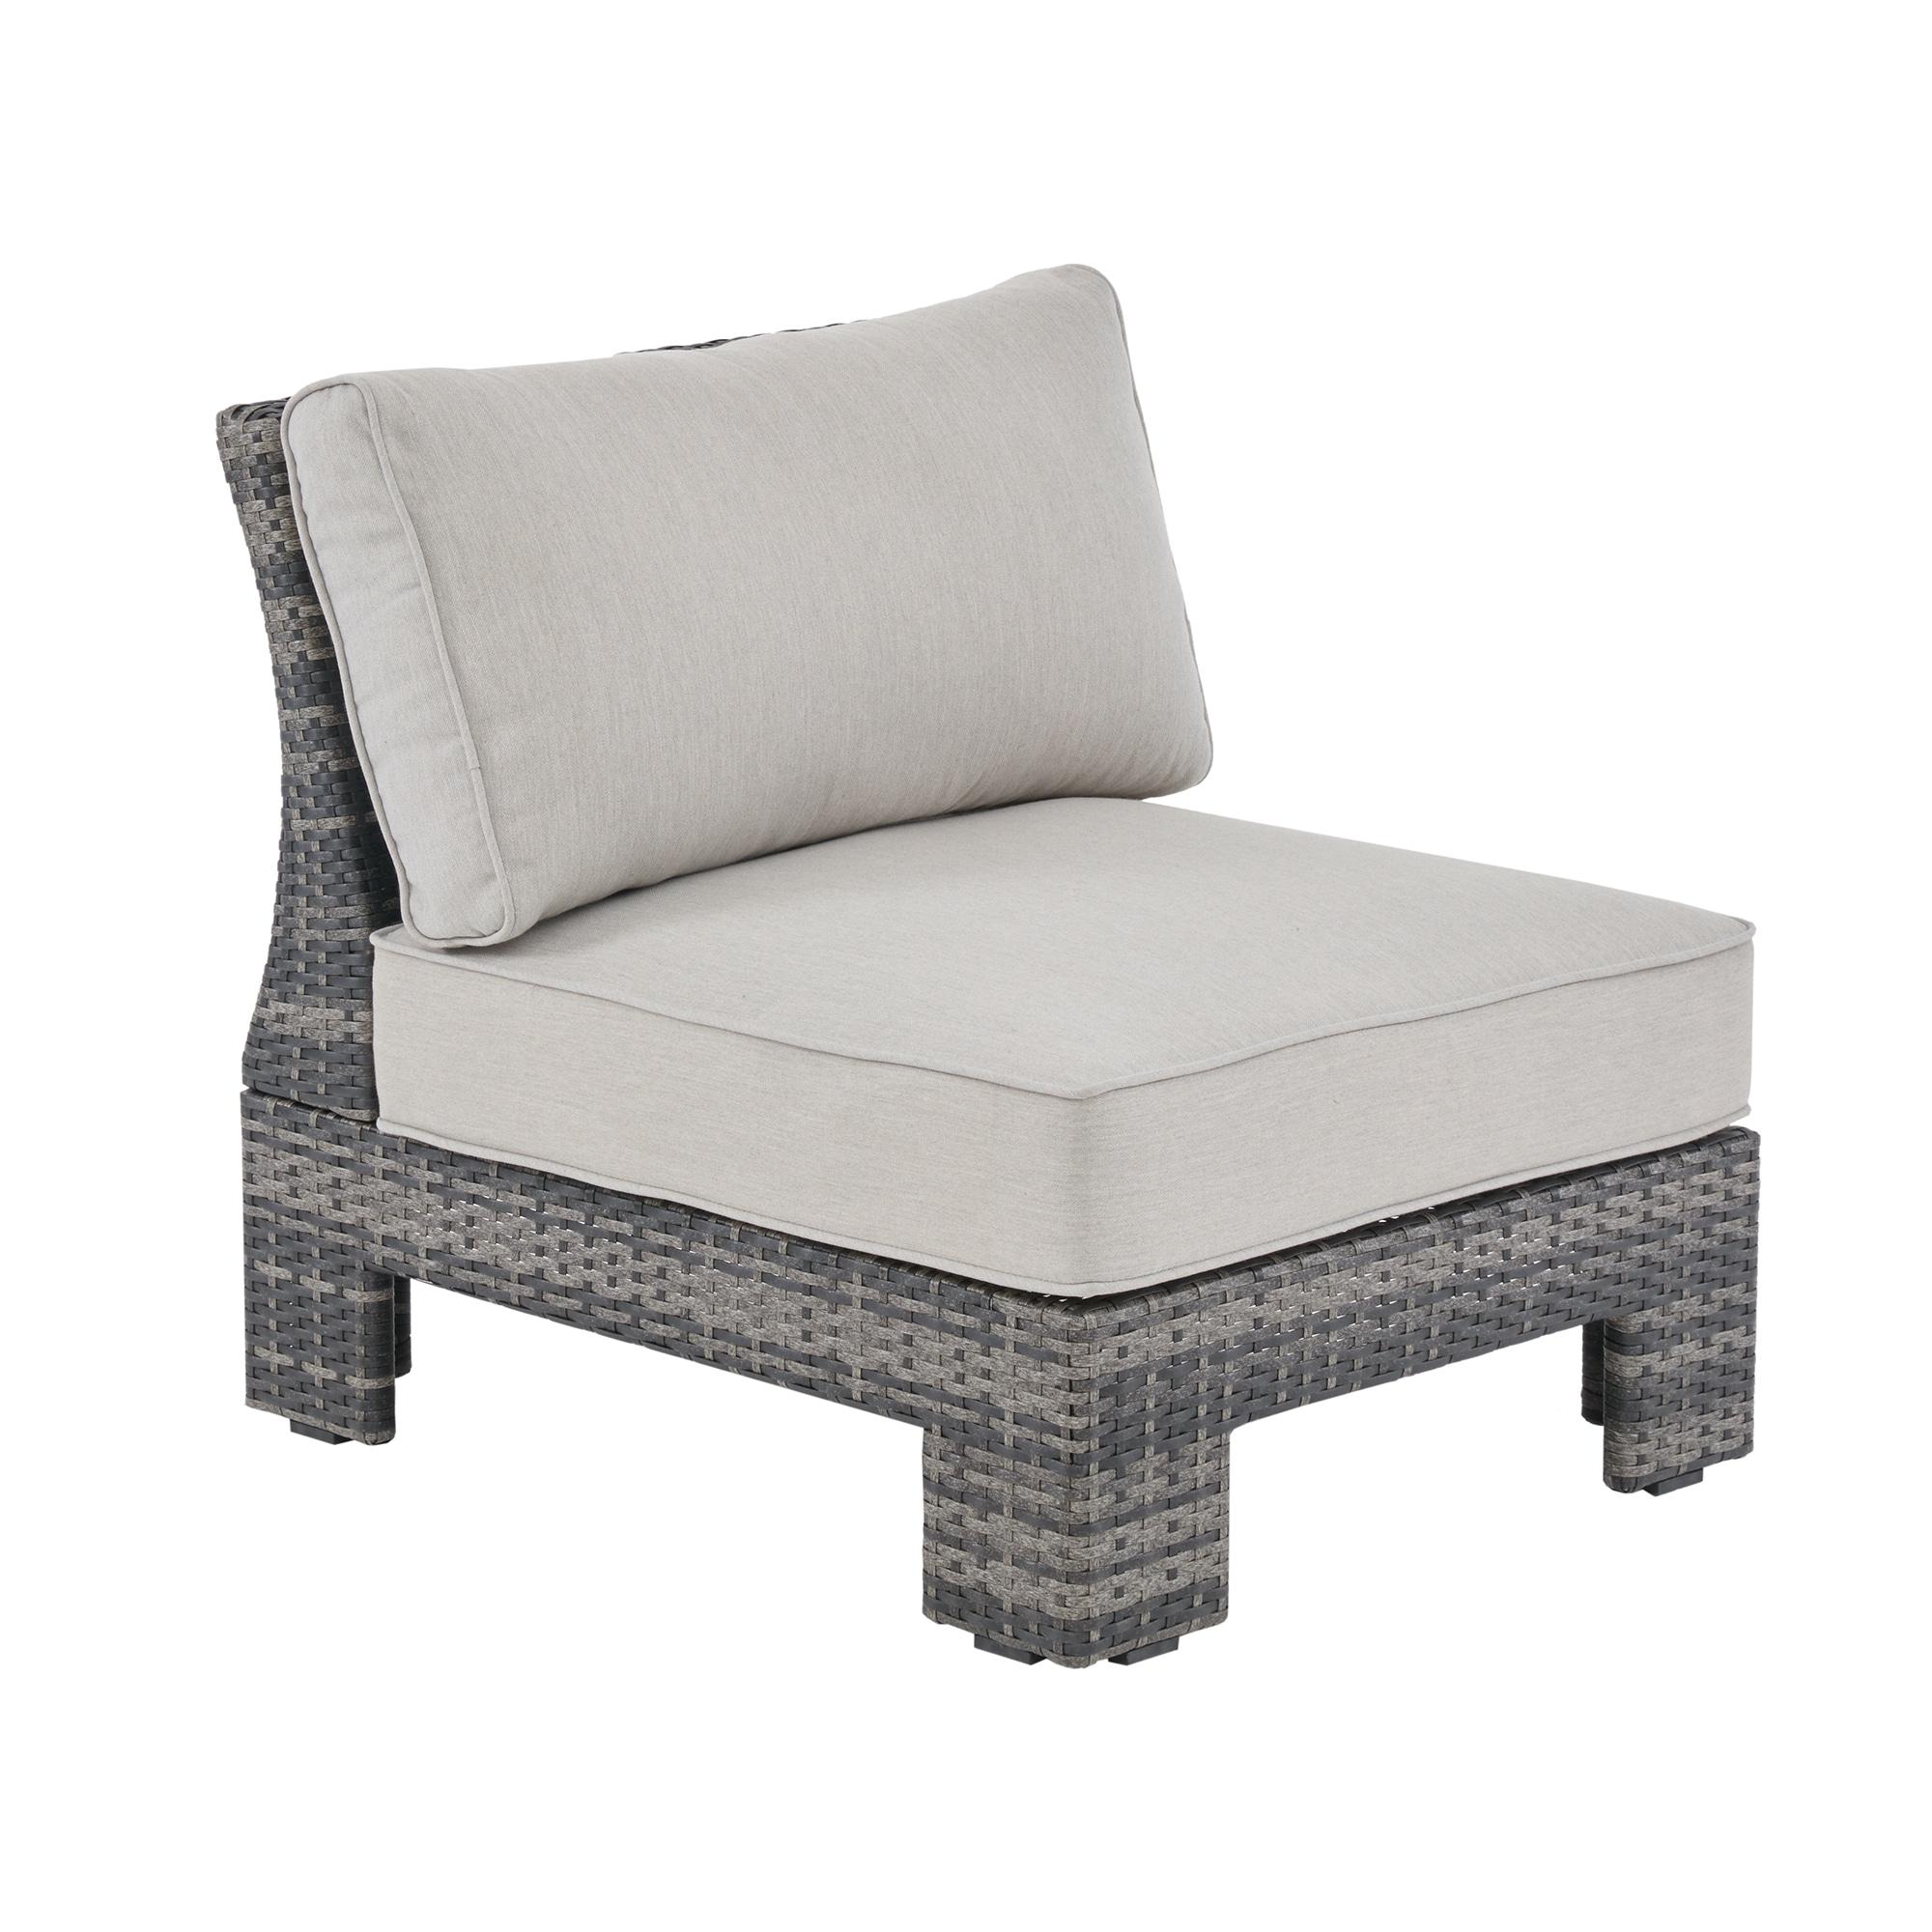 group b wi shop mattress futon madison products futons bed furniture